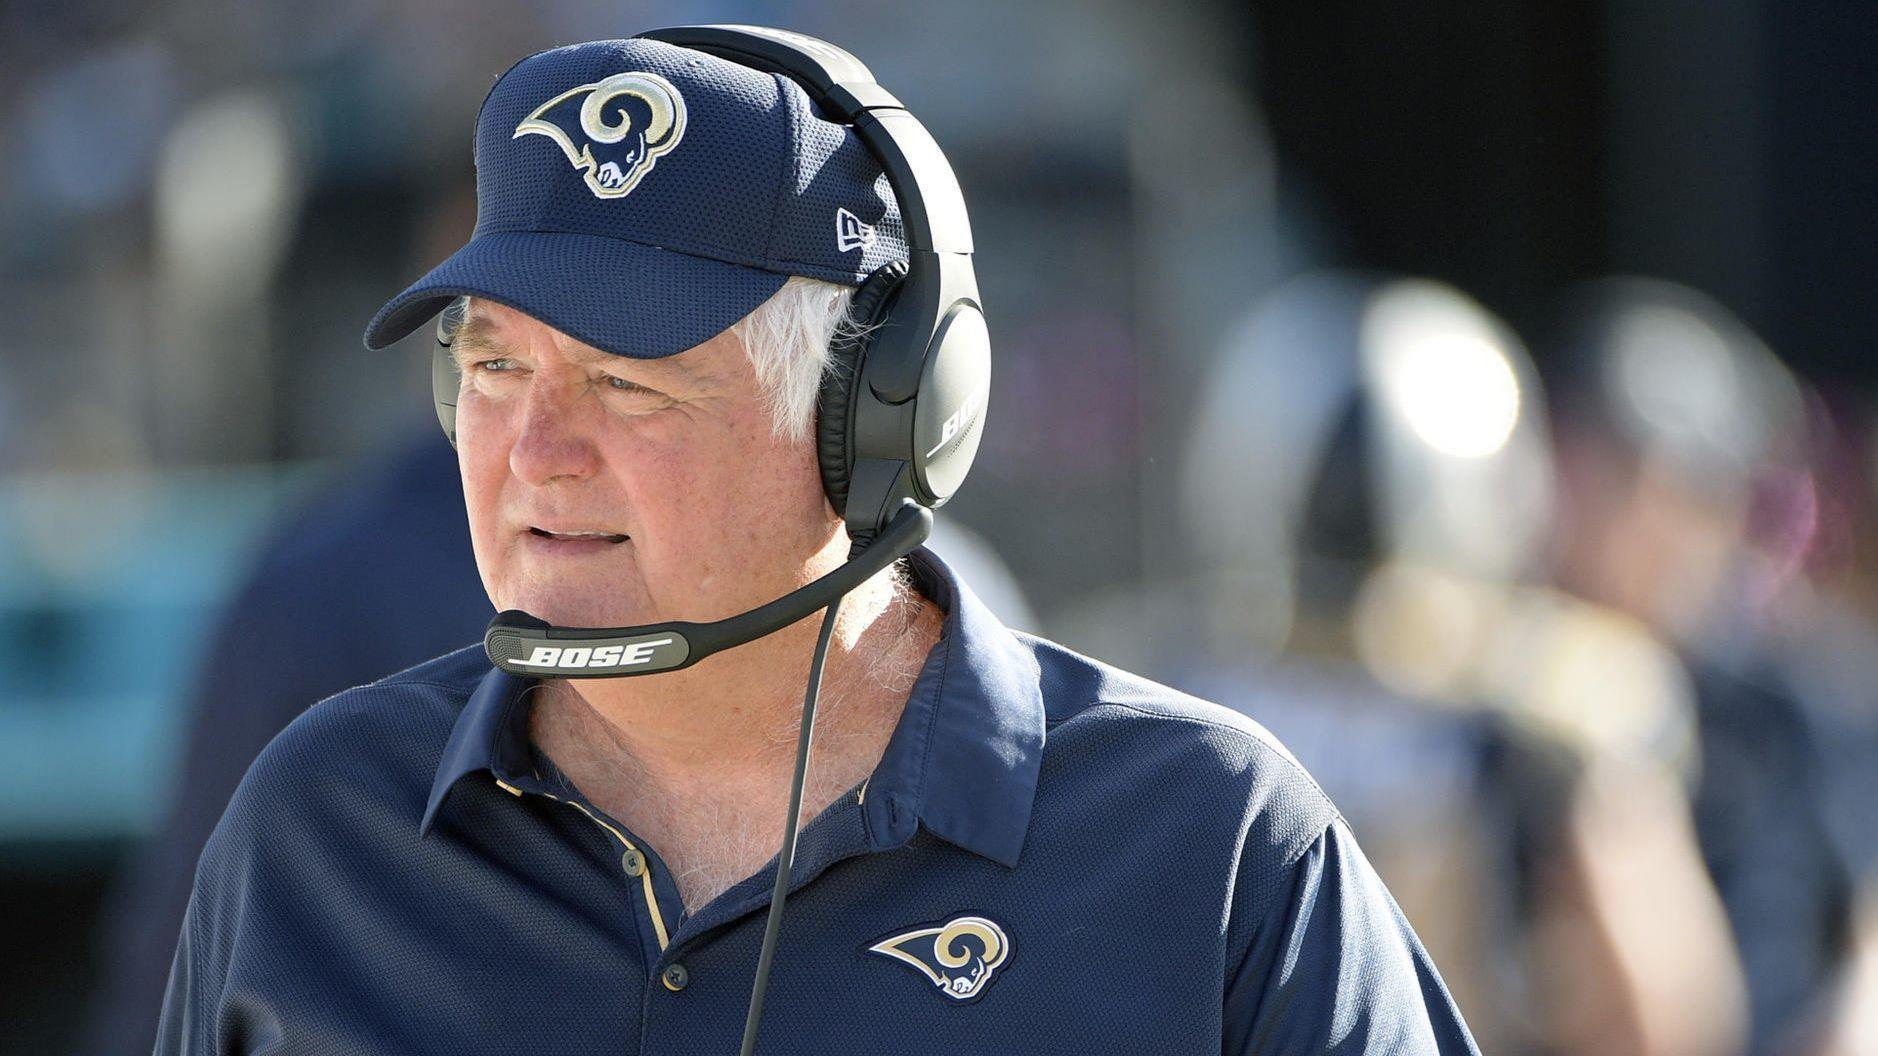 coach boone quotes